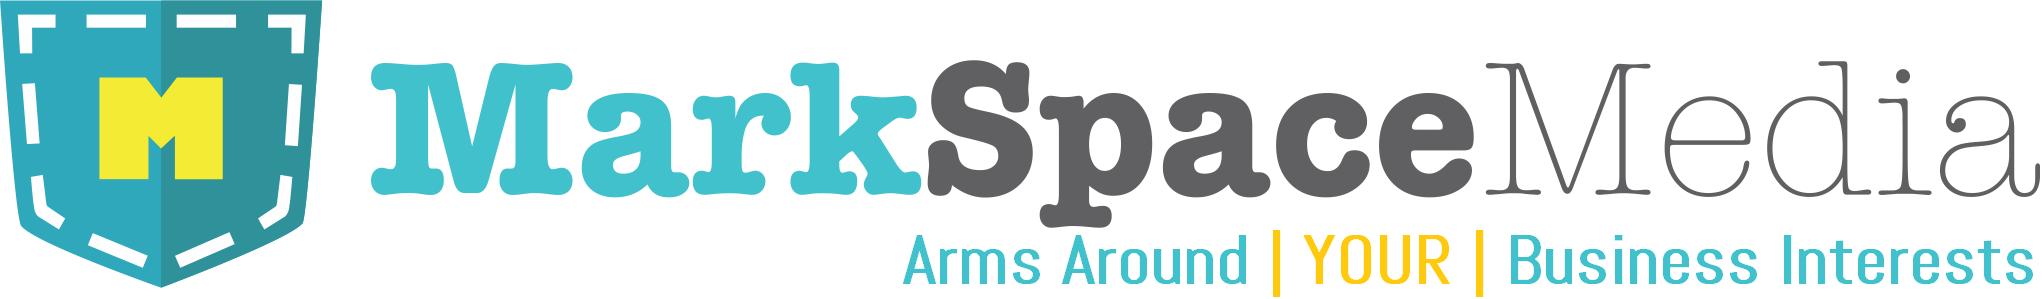 MarkSpace Media